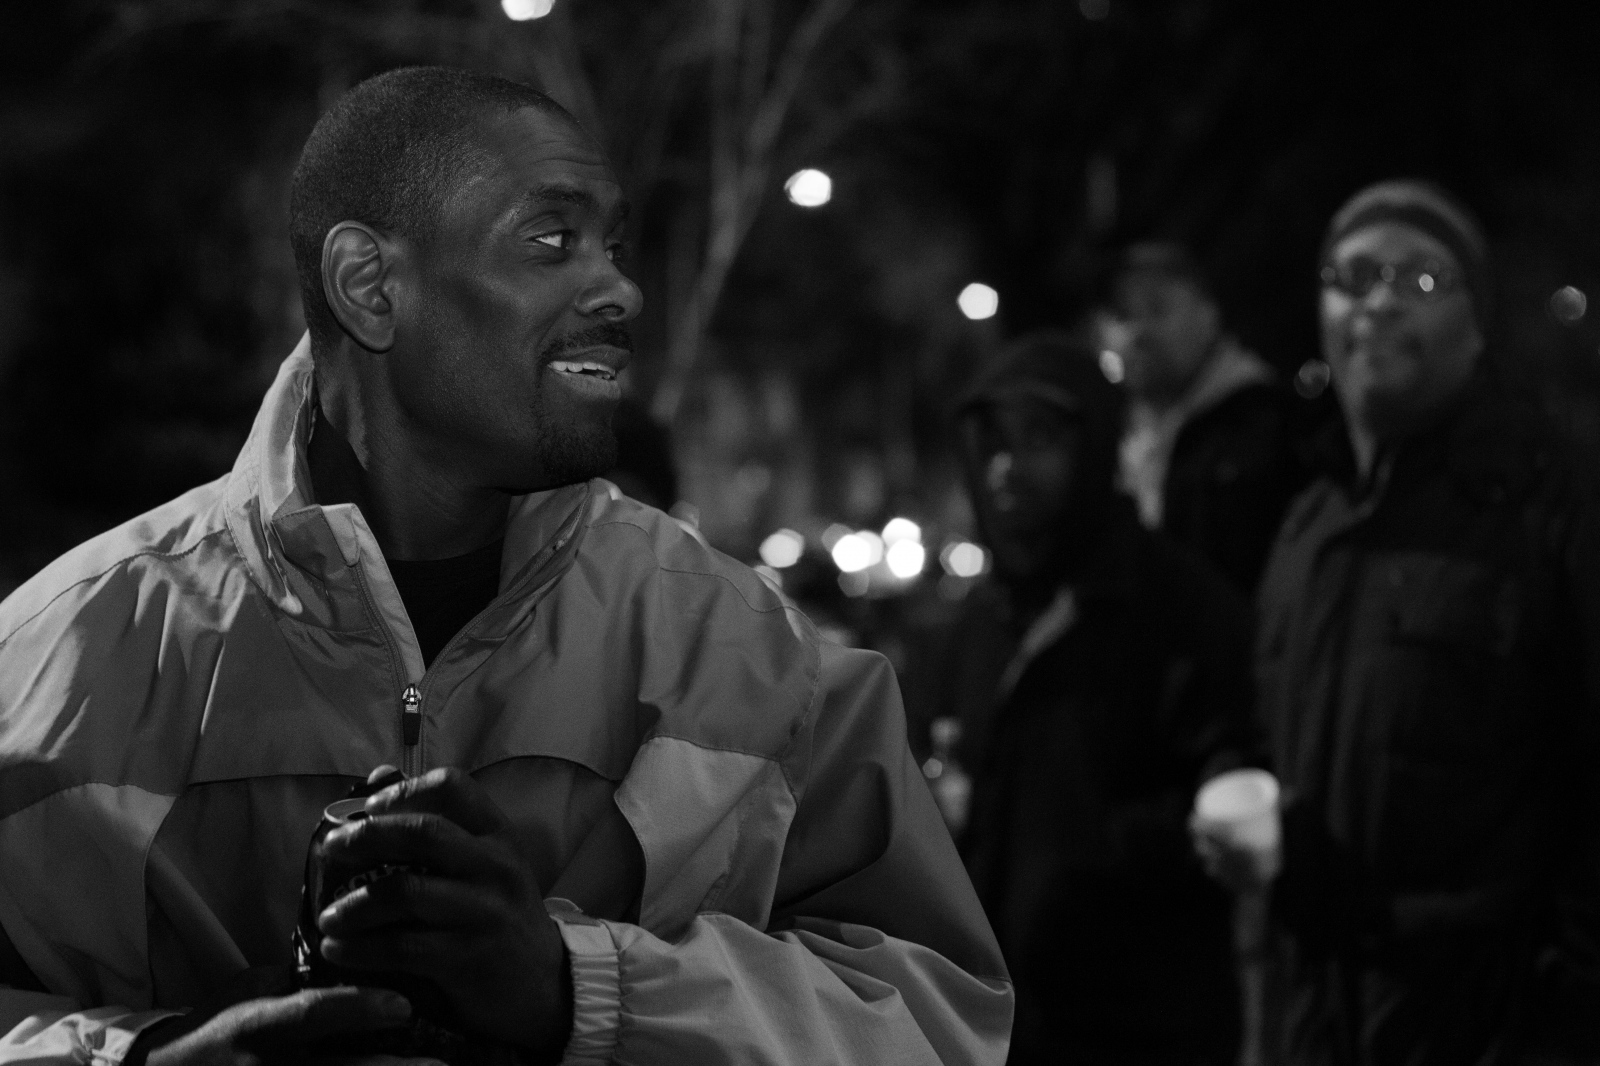 a group of black men talking outside